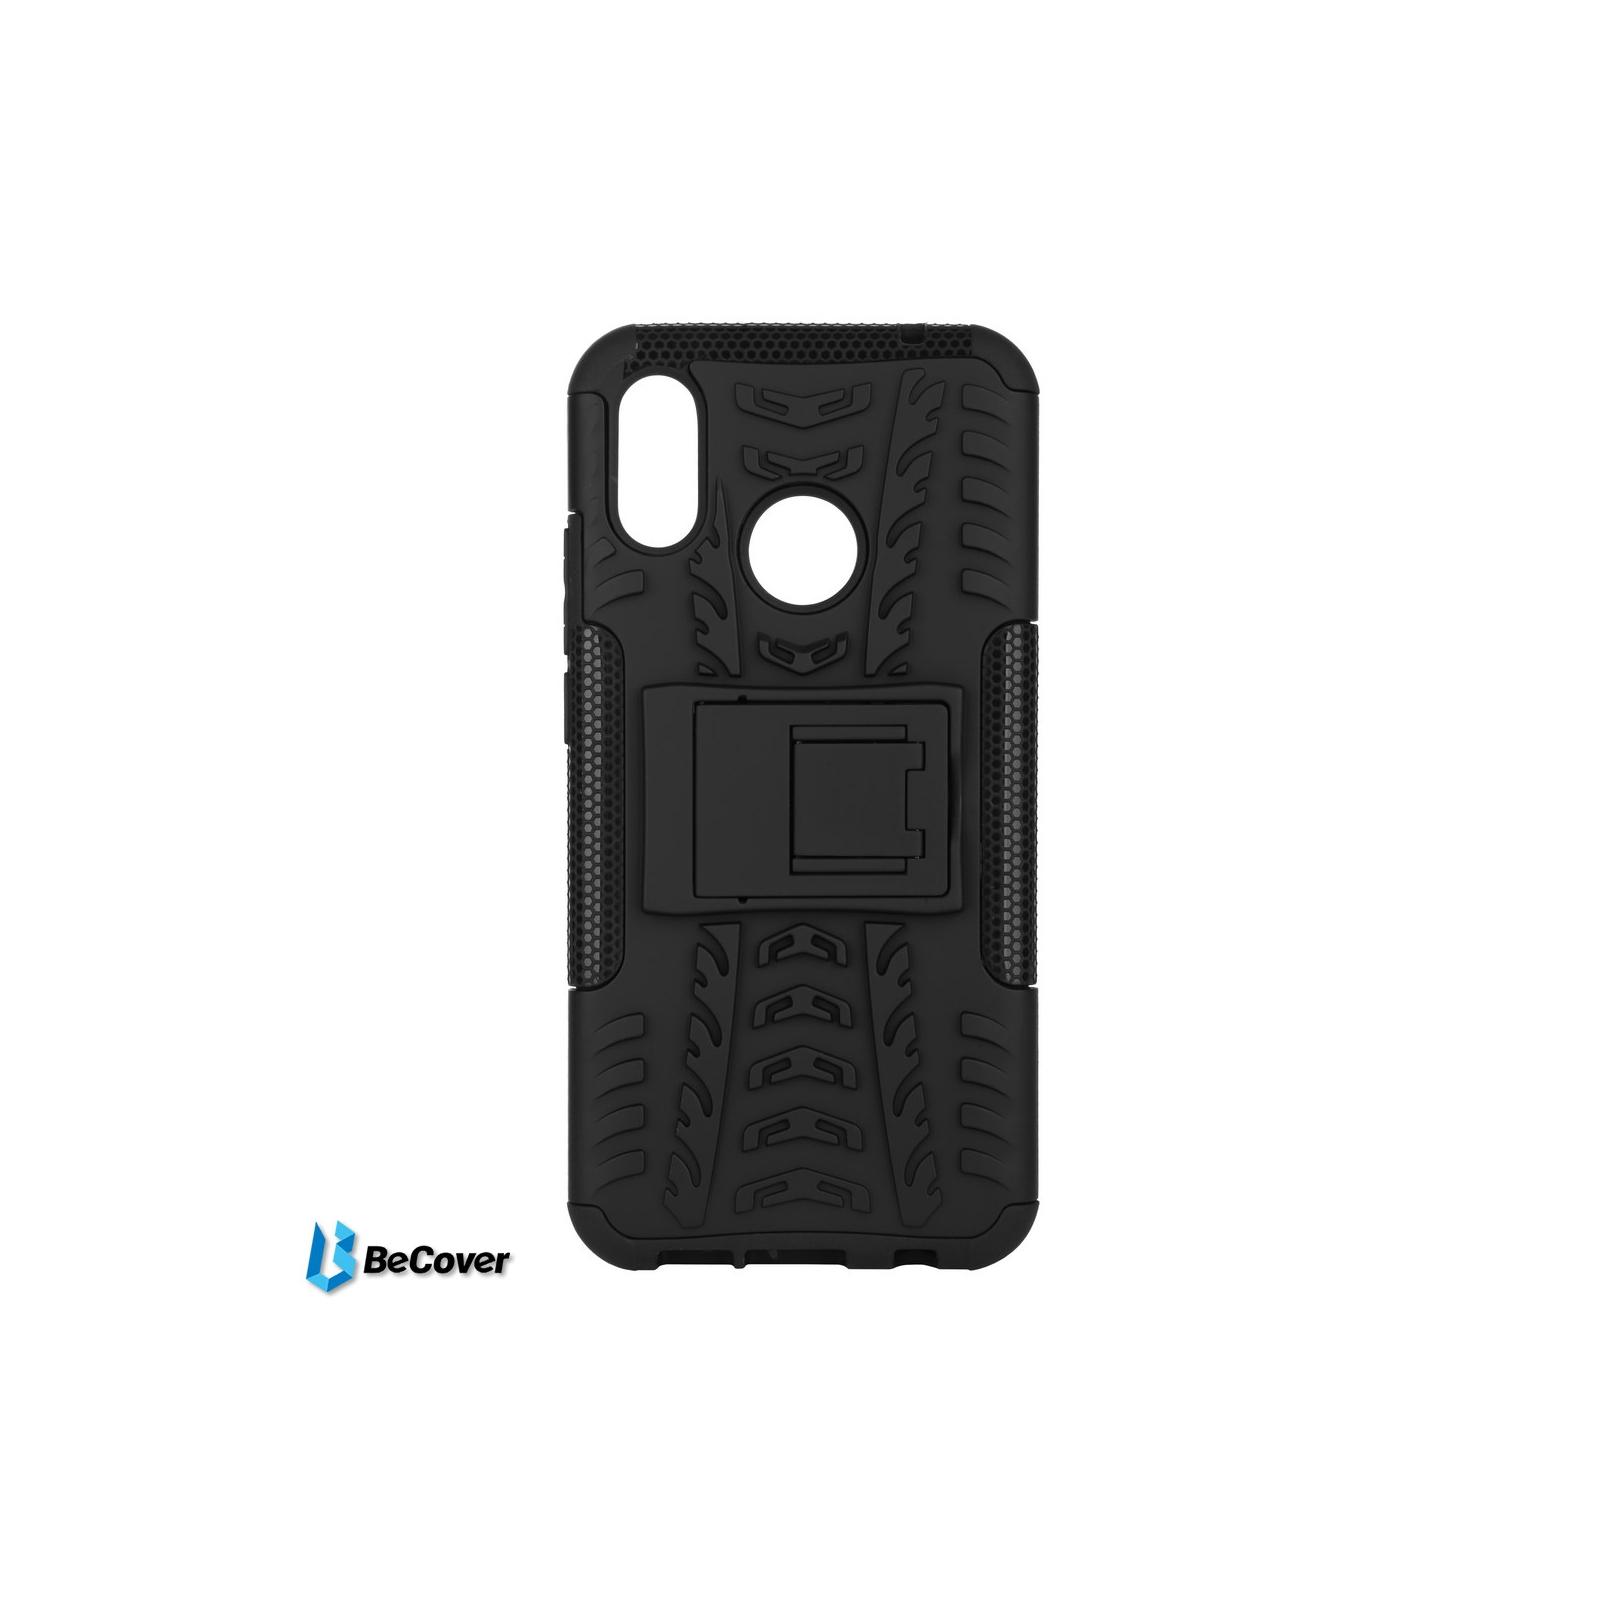 Чехол для моб. телефона BeCover Huawei P Smart+ Black (702769)